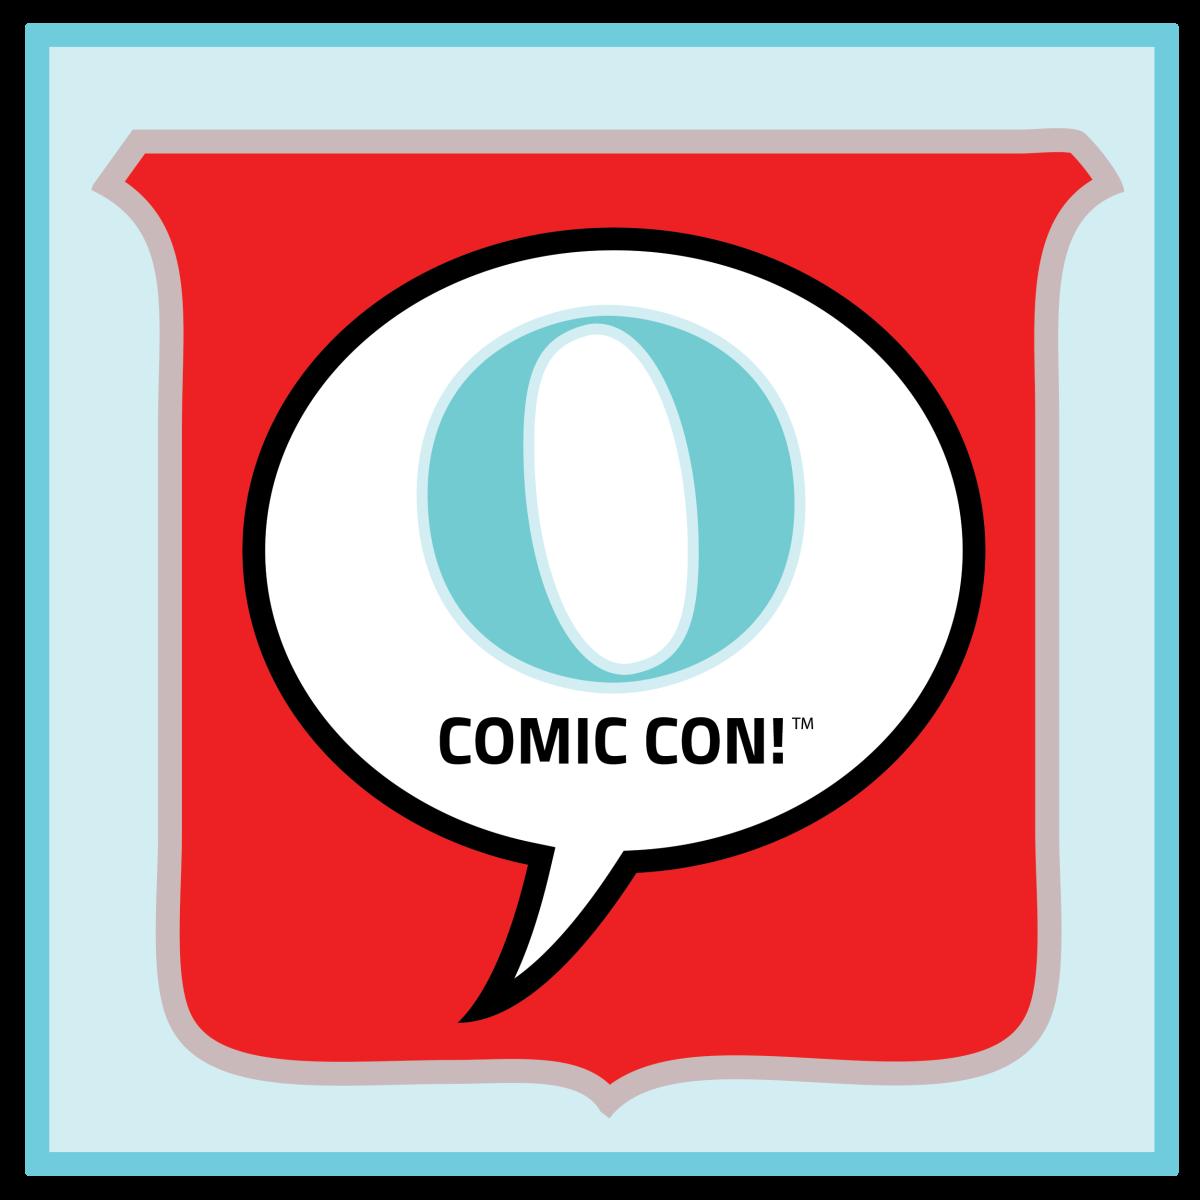 May The 4th Be With You Logo: OmahaComicConLogo (2)